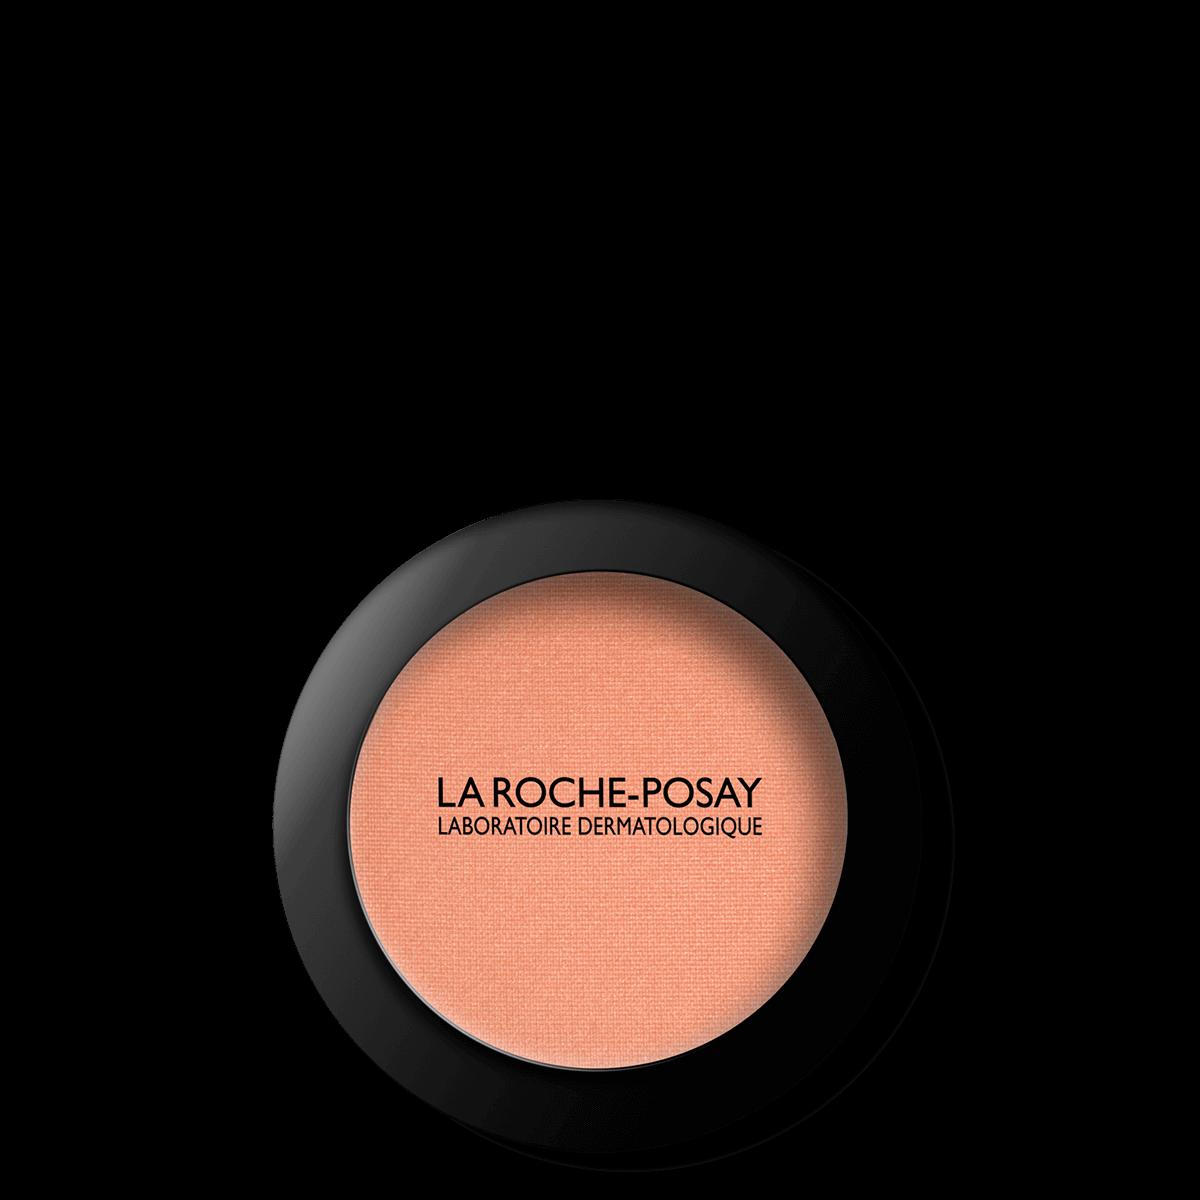 La Roche Posay Sensitiv Toleriane Makeup BLUSH KobberBronze 33378724